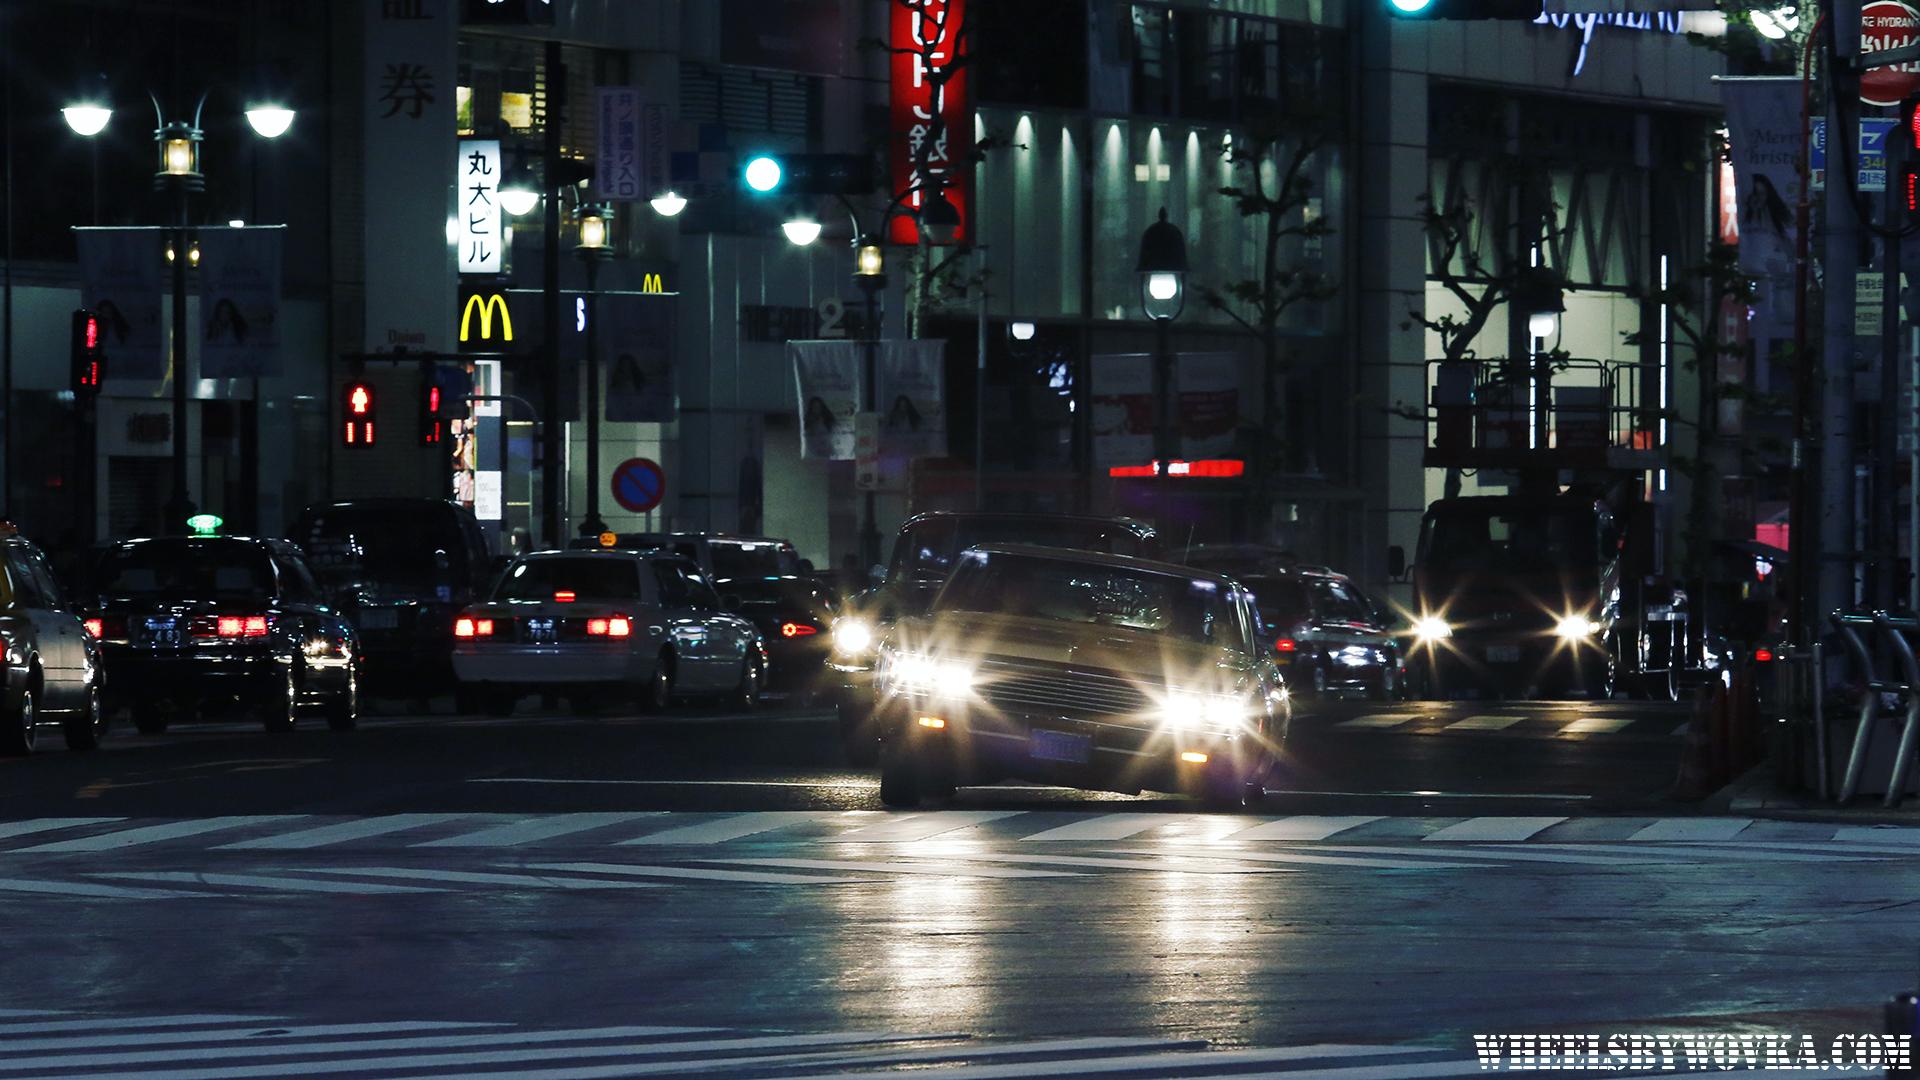 shibuya-japan-tokyo-lowrider-cruise-night-15